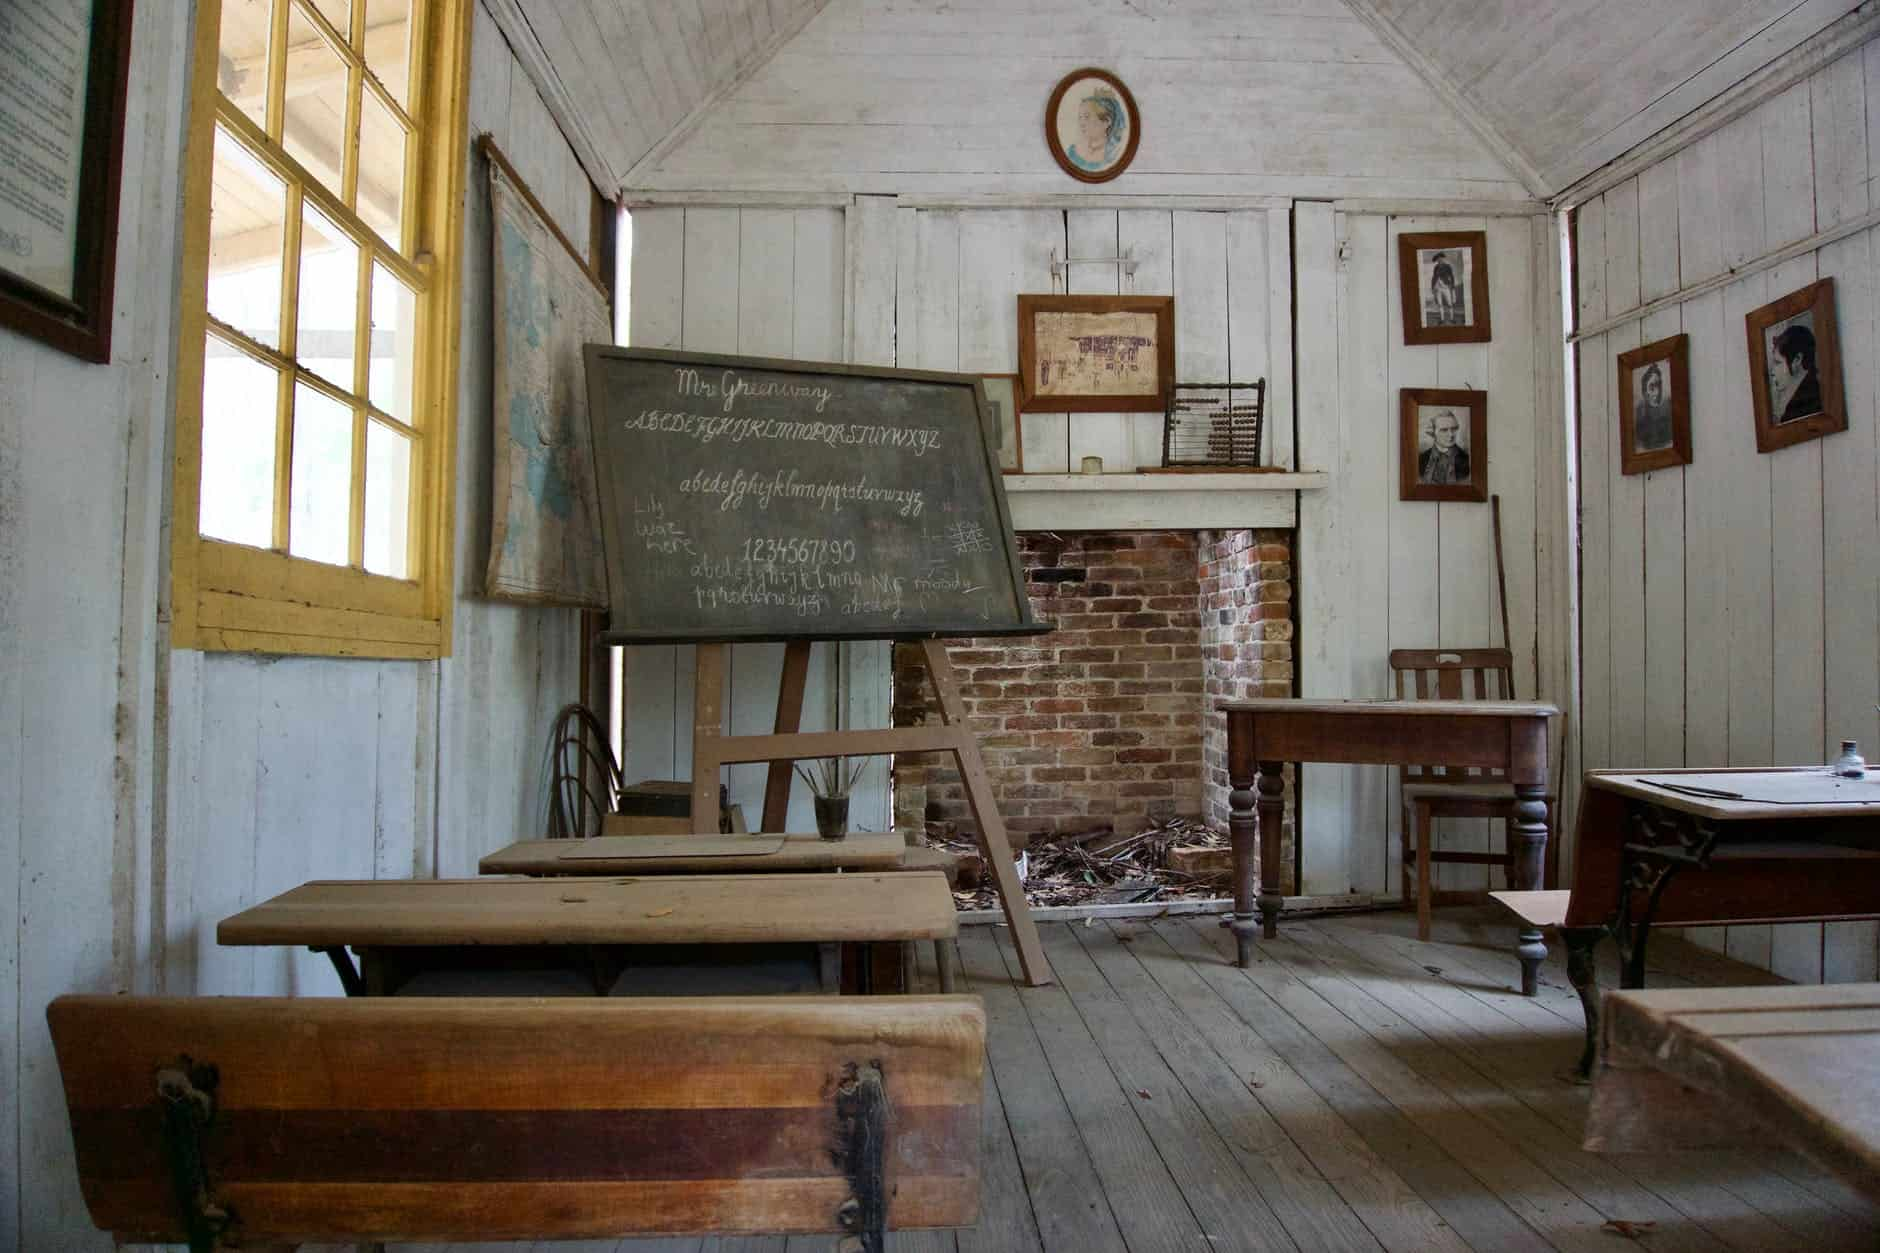 teaching and training